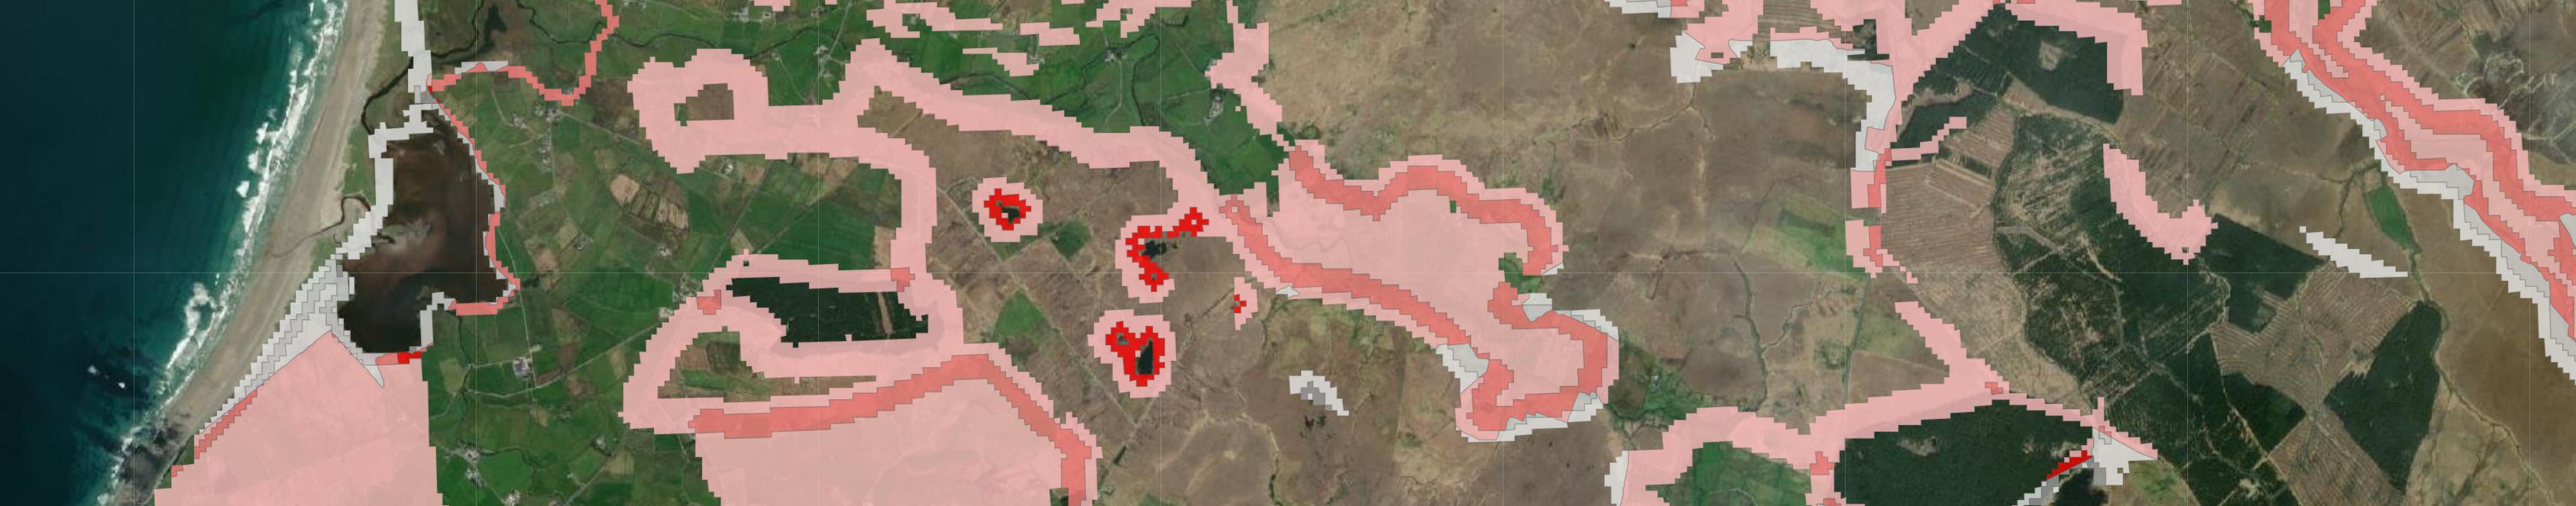 Mayo Dark and Wild Map Extract